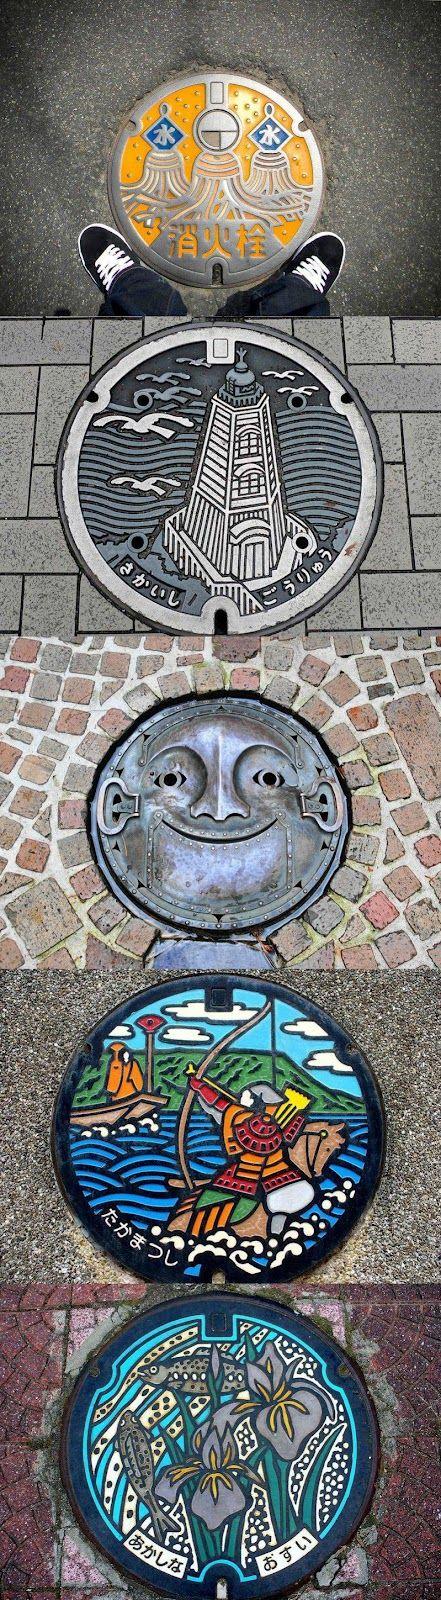 streetart - japanese art of man hole covers